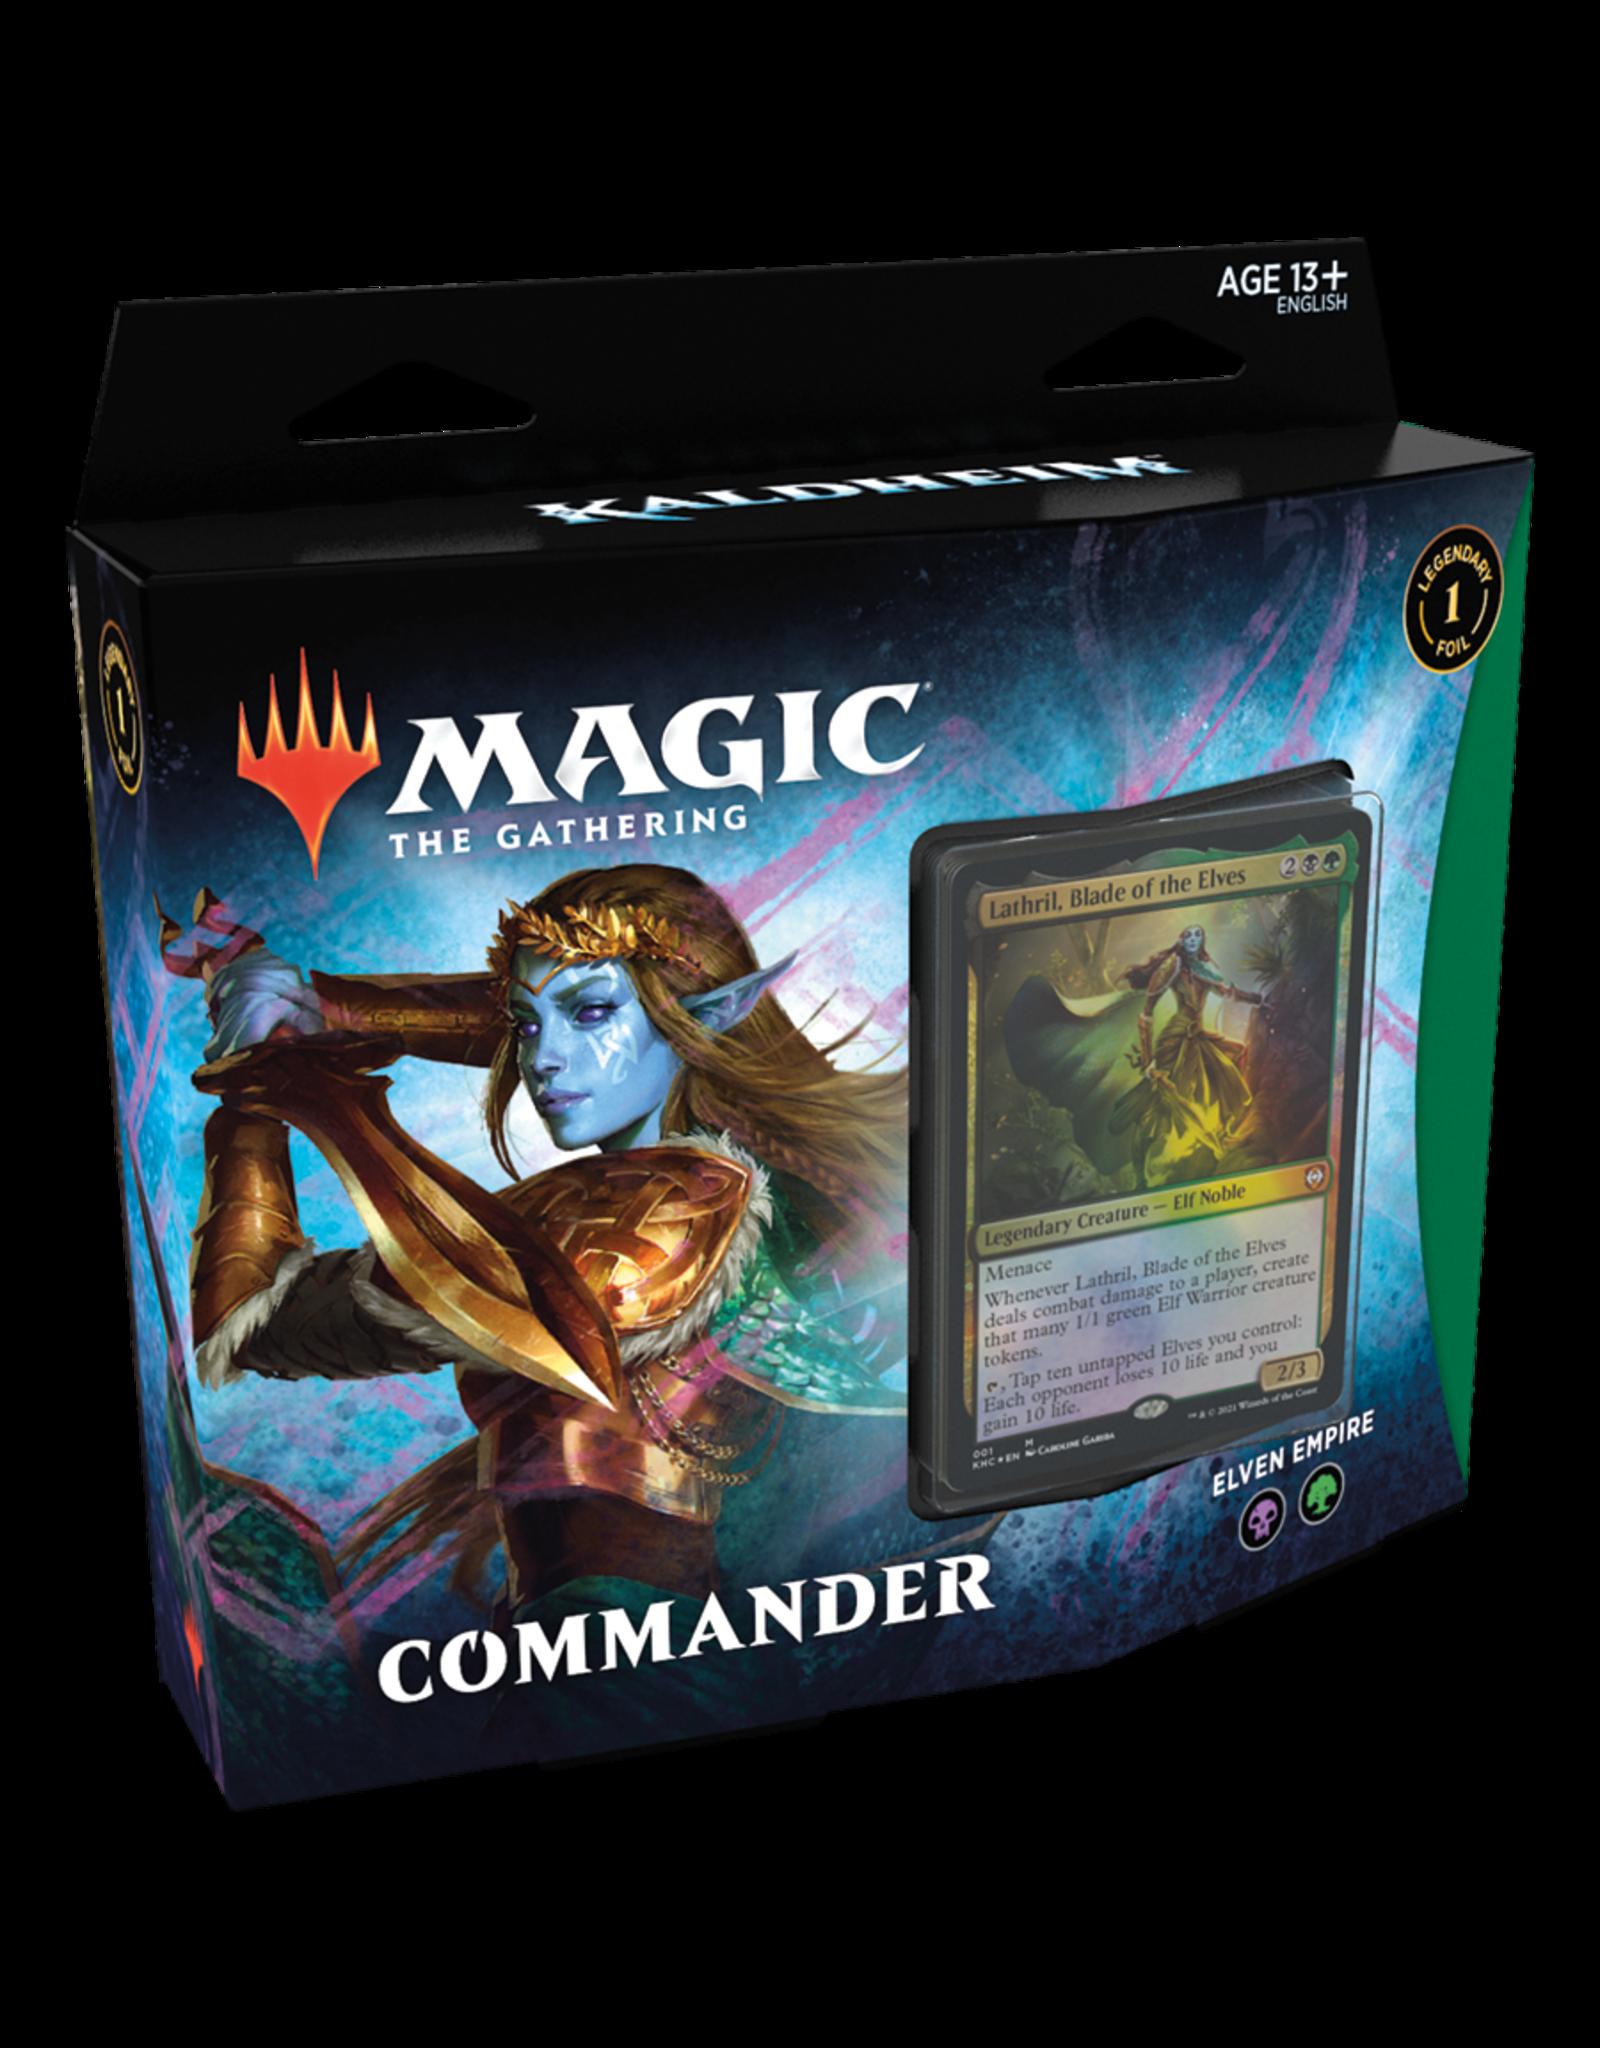 Magic the Gathering: Kaldheim Commander Deck - Elven Empire